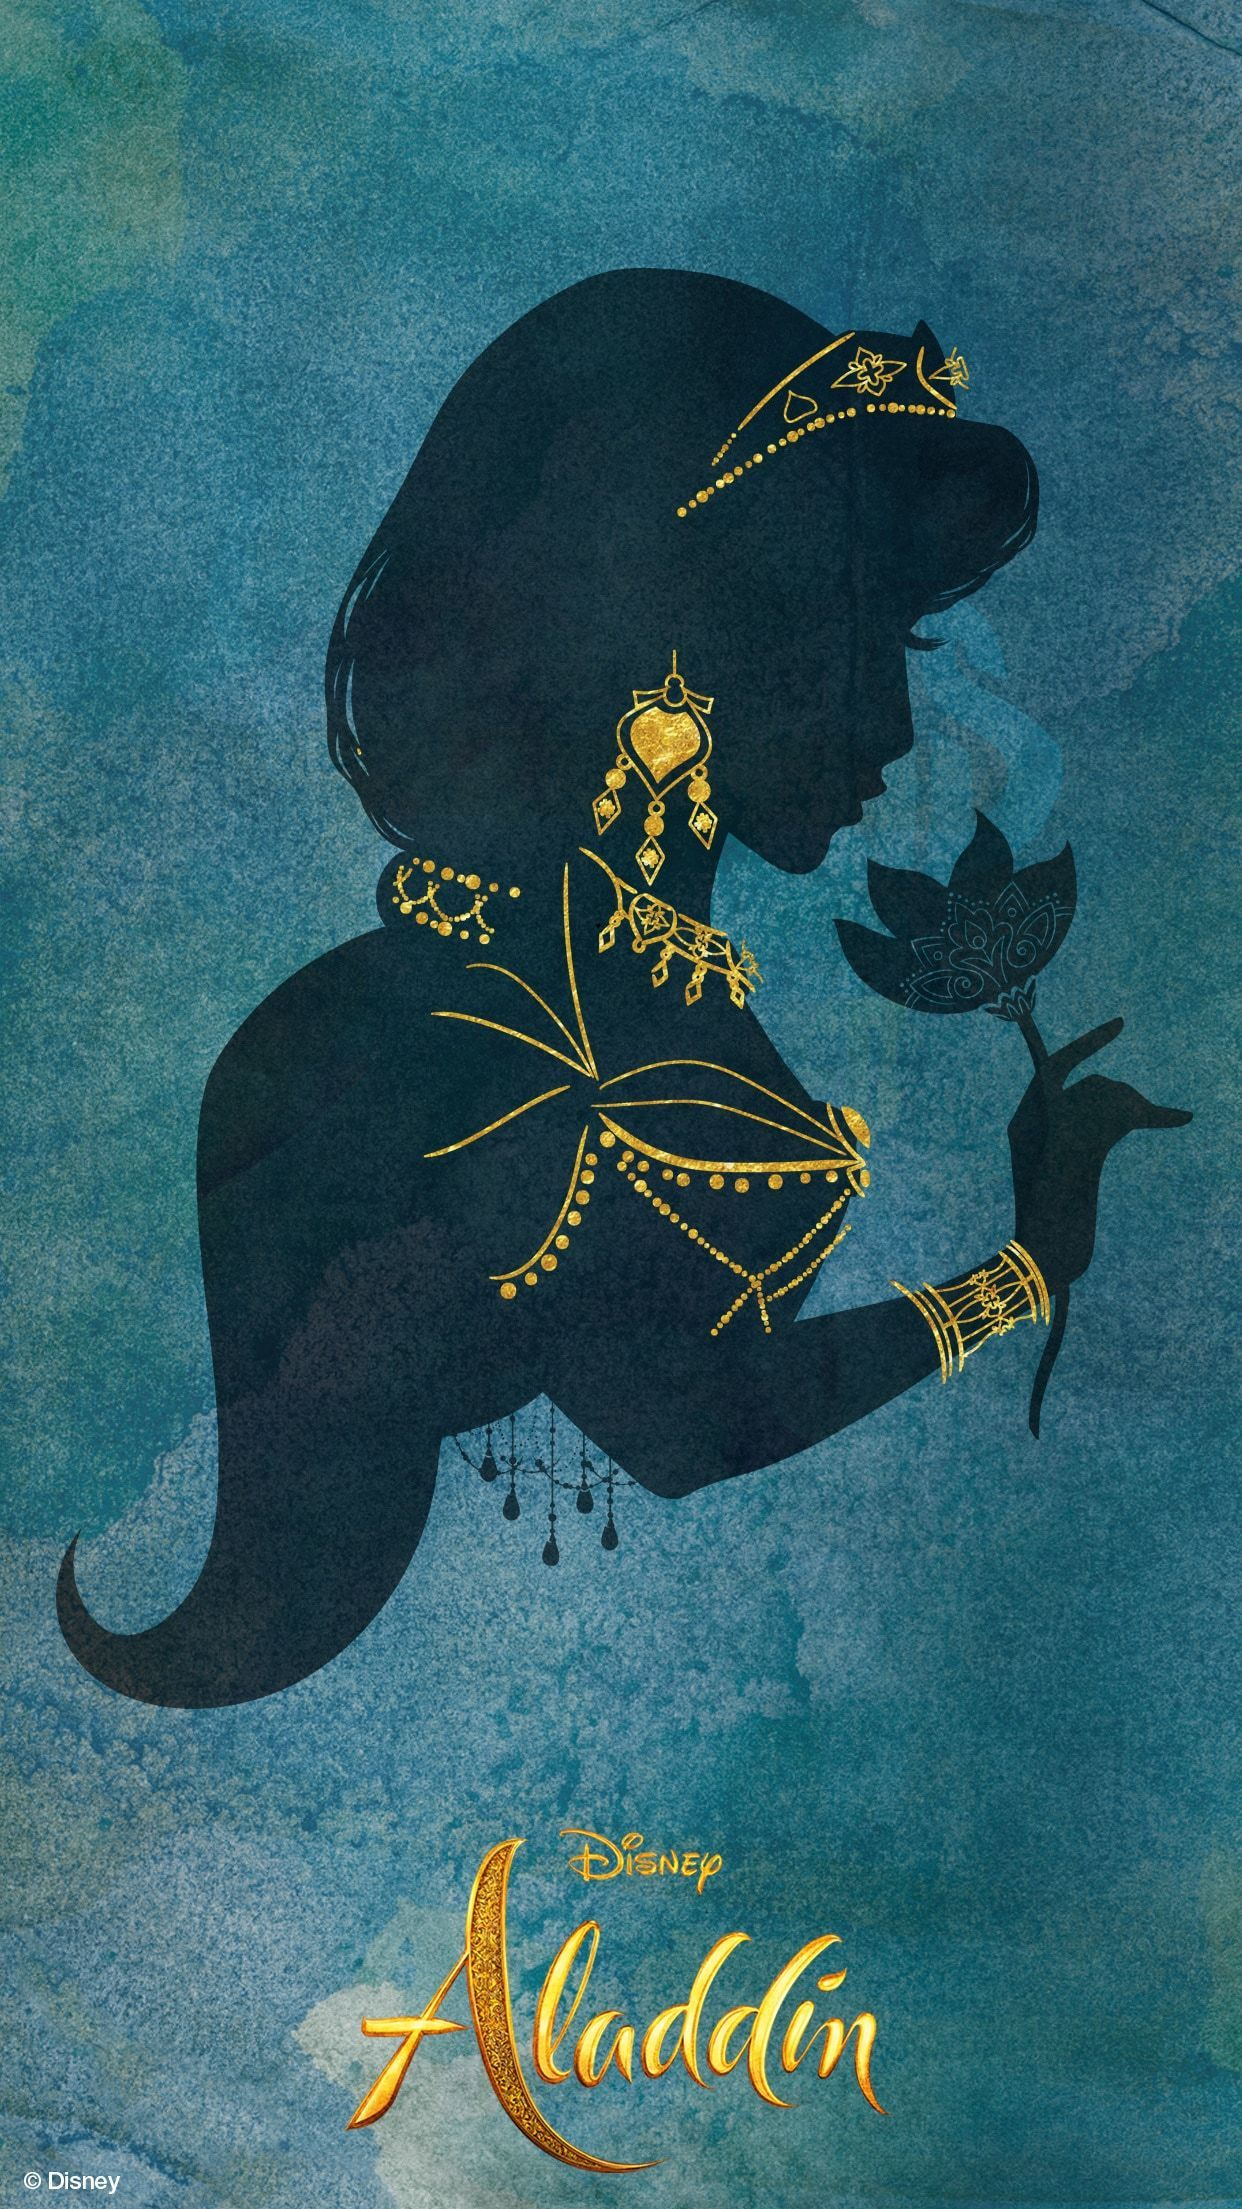 Aladdin Mobile Wallpapers | Disney Singapore - Disney princess wallpaper - Otuziki Blog